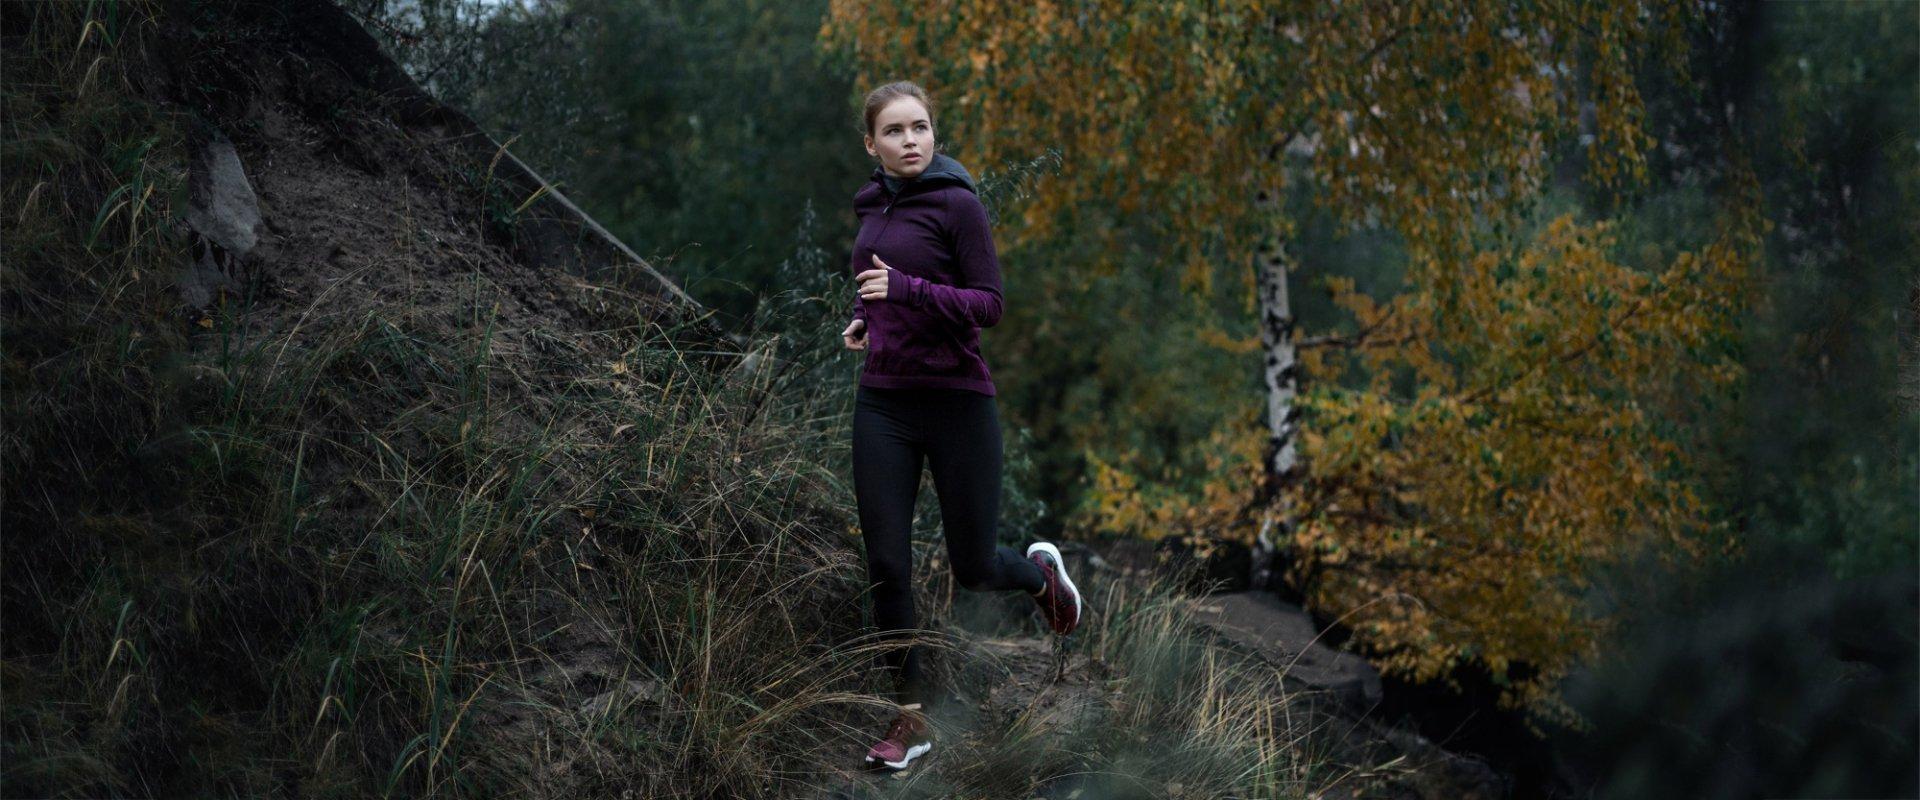 Adidas Жінкам - MEGASPORT